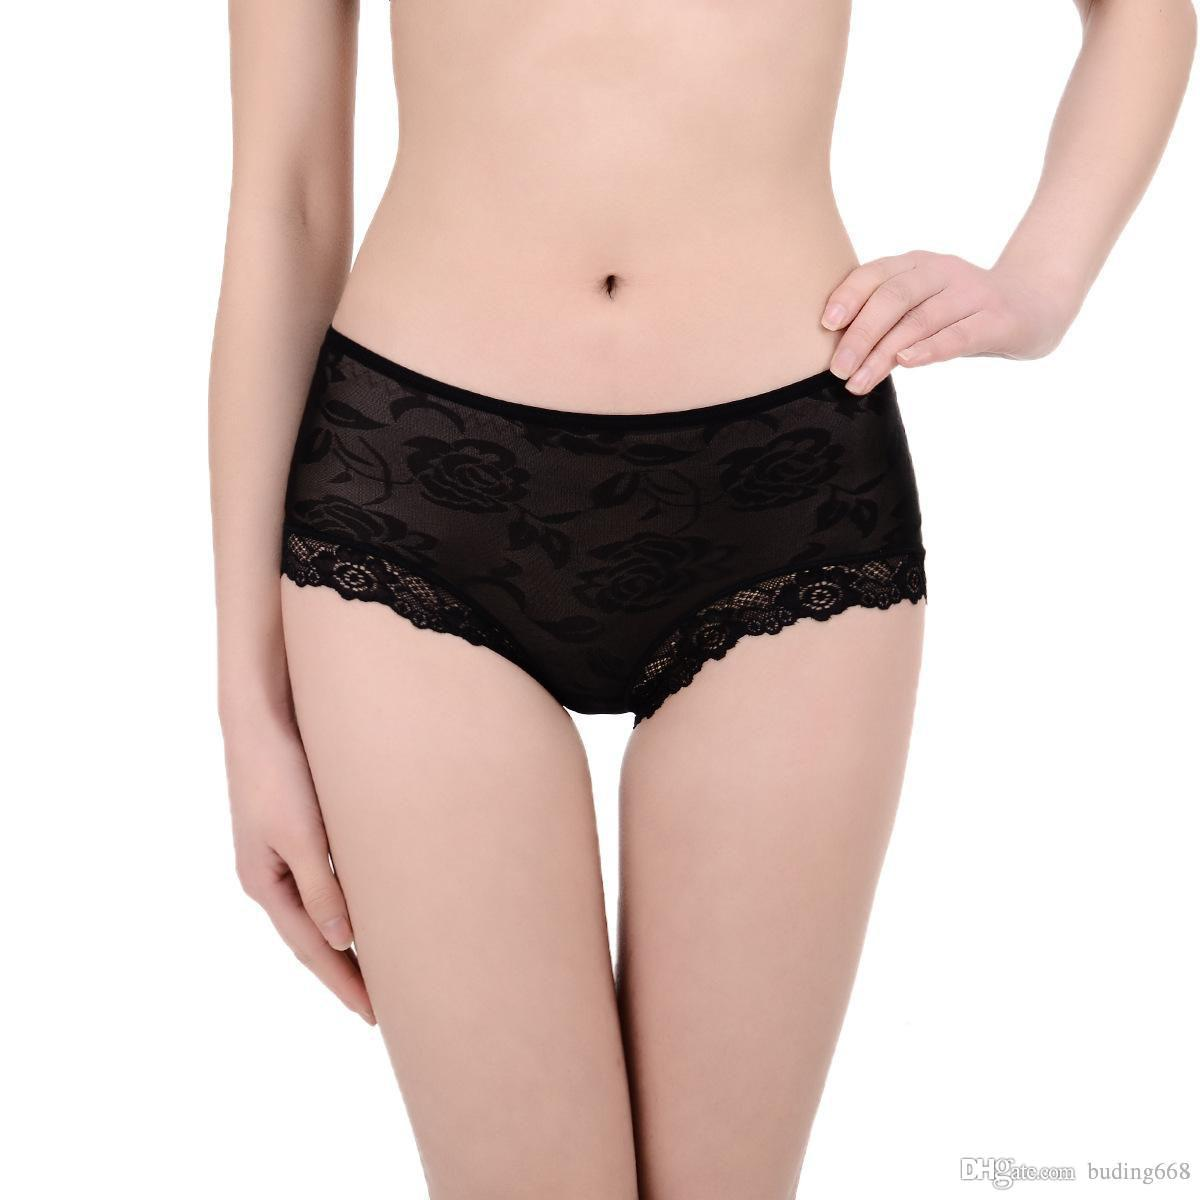 New Sexy satin bikini brief women underwear for Angola market women satin underpants lady panties lingerie intimate undergarment Q1688